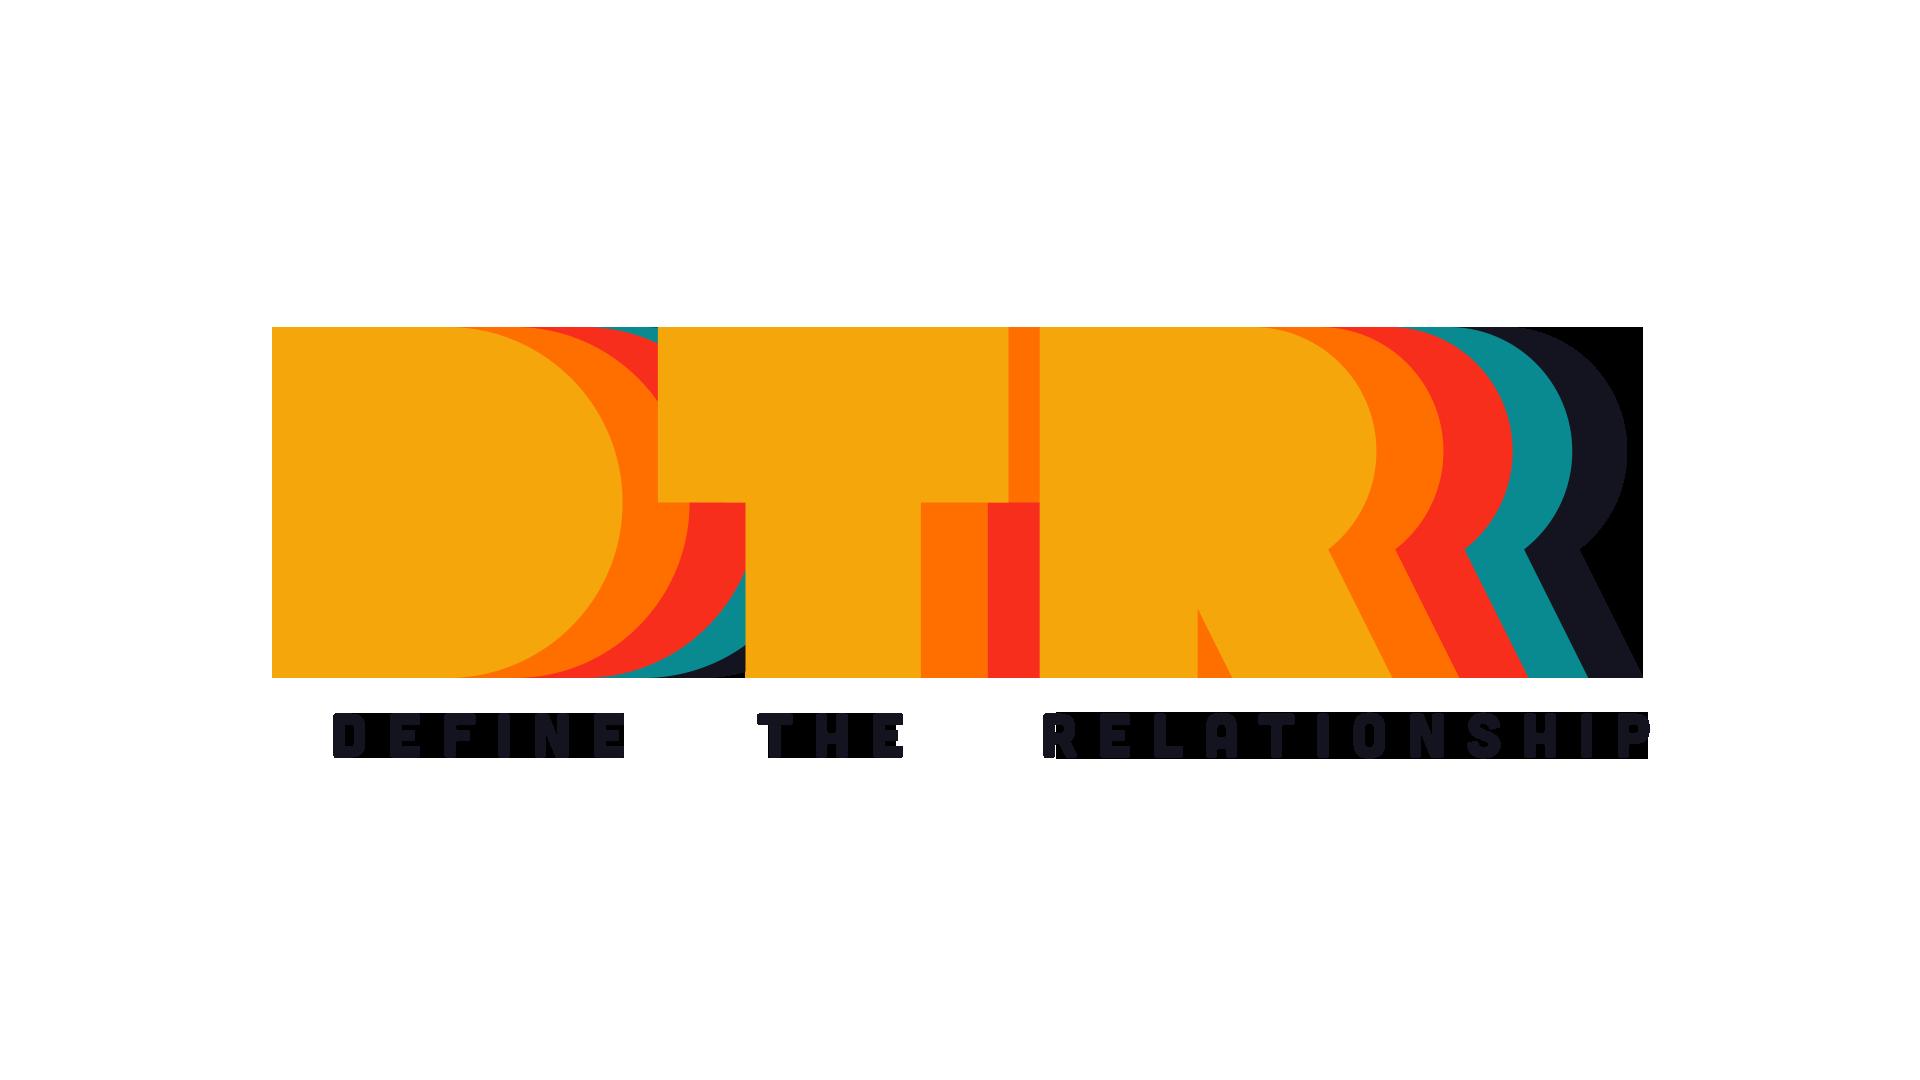 DTR: Define the Relationship